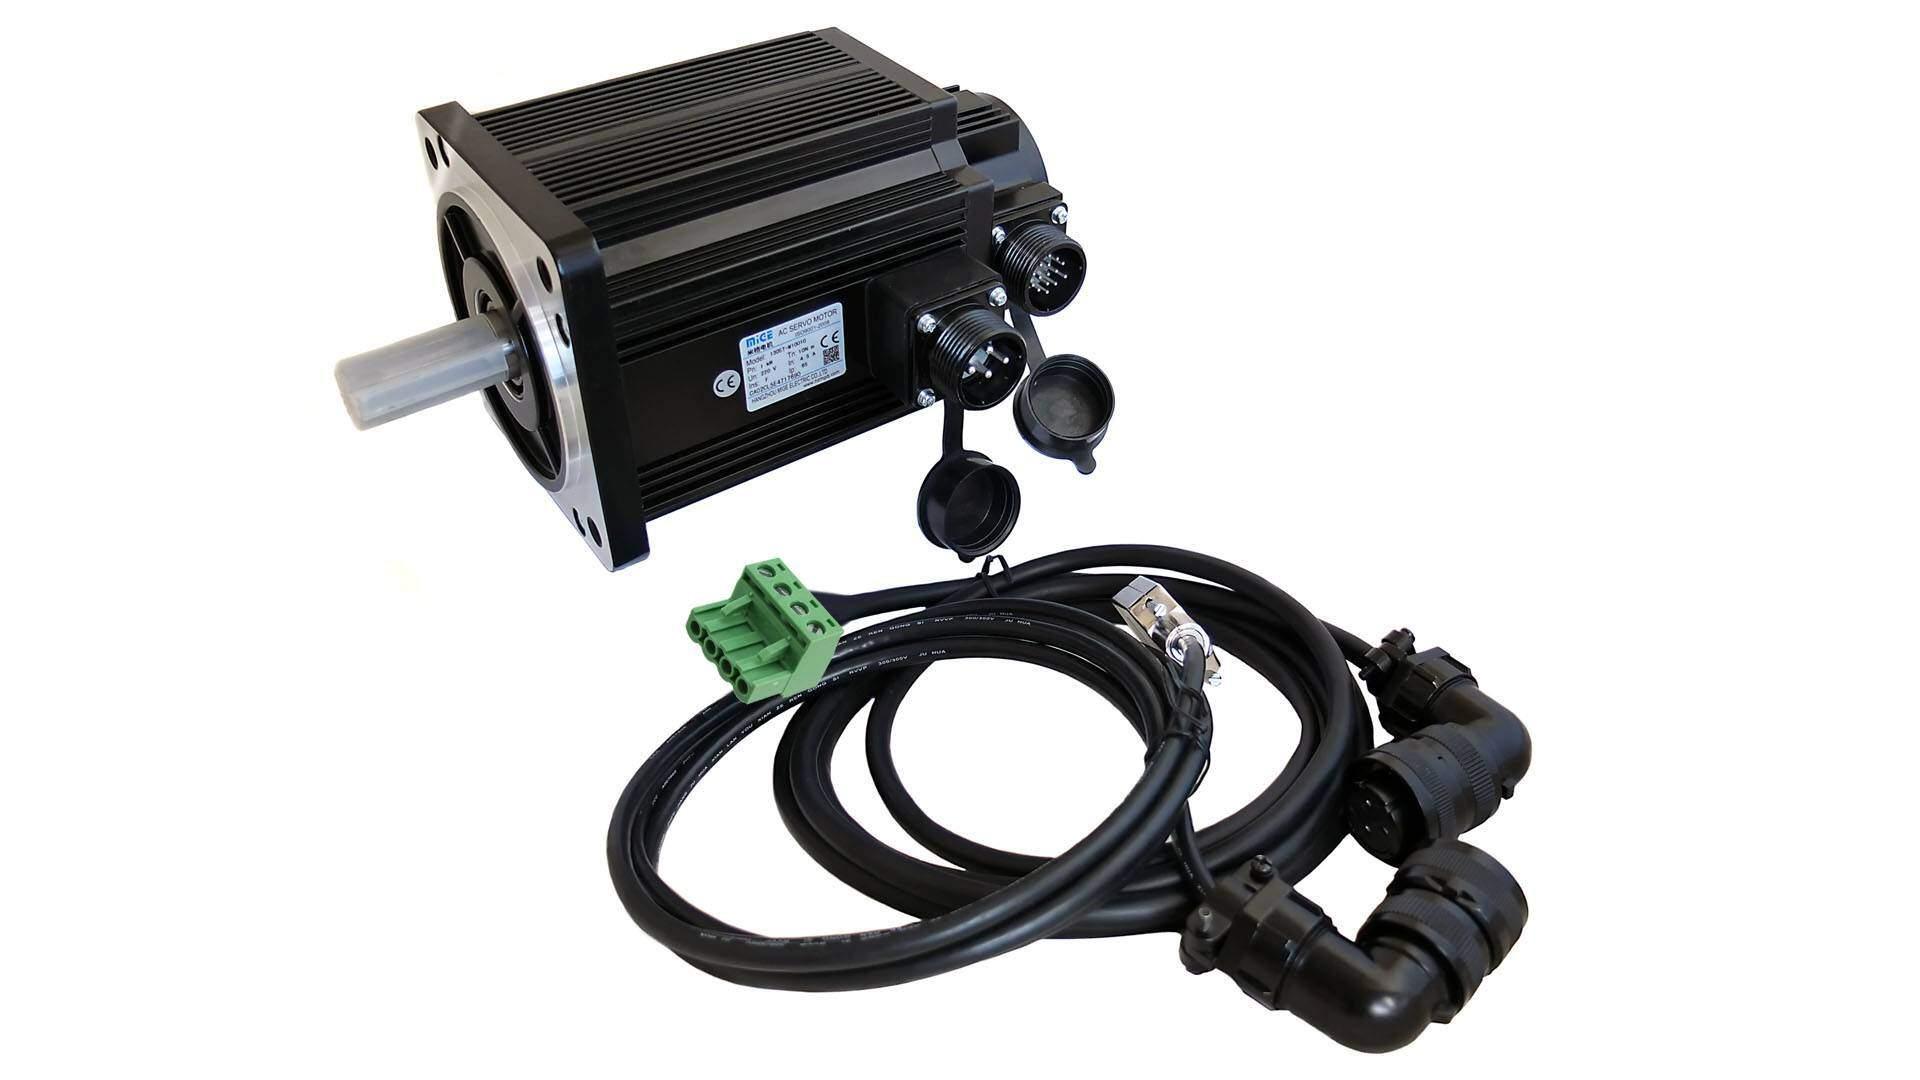 MiGE motor package 10000ppr – SimuCUBE ready